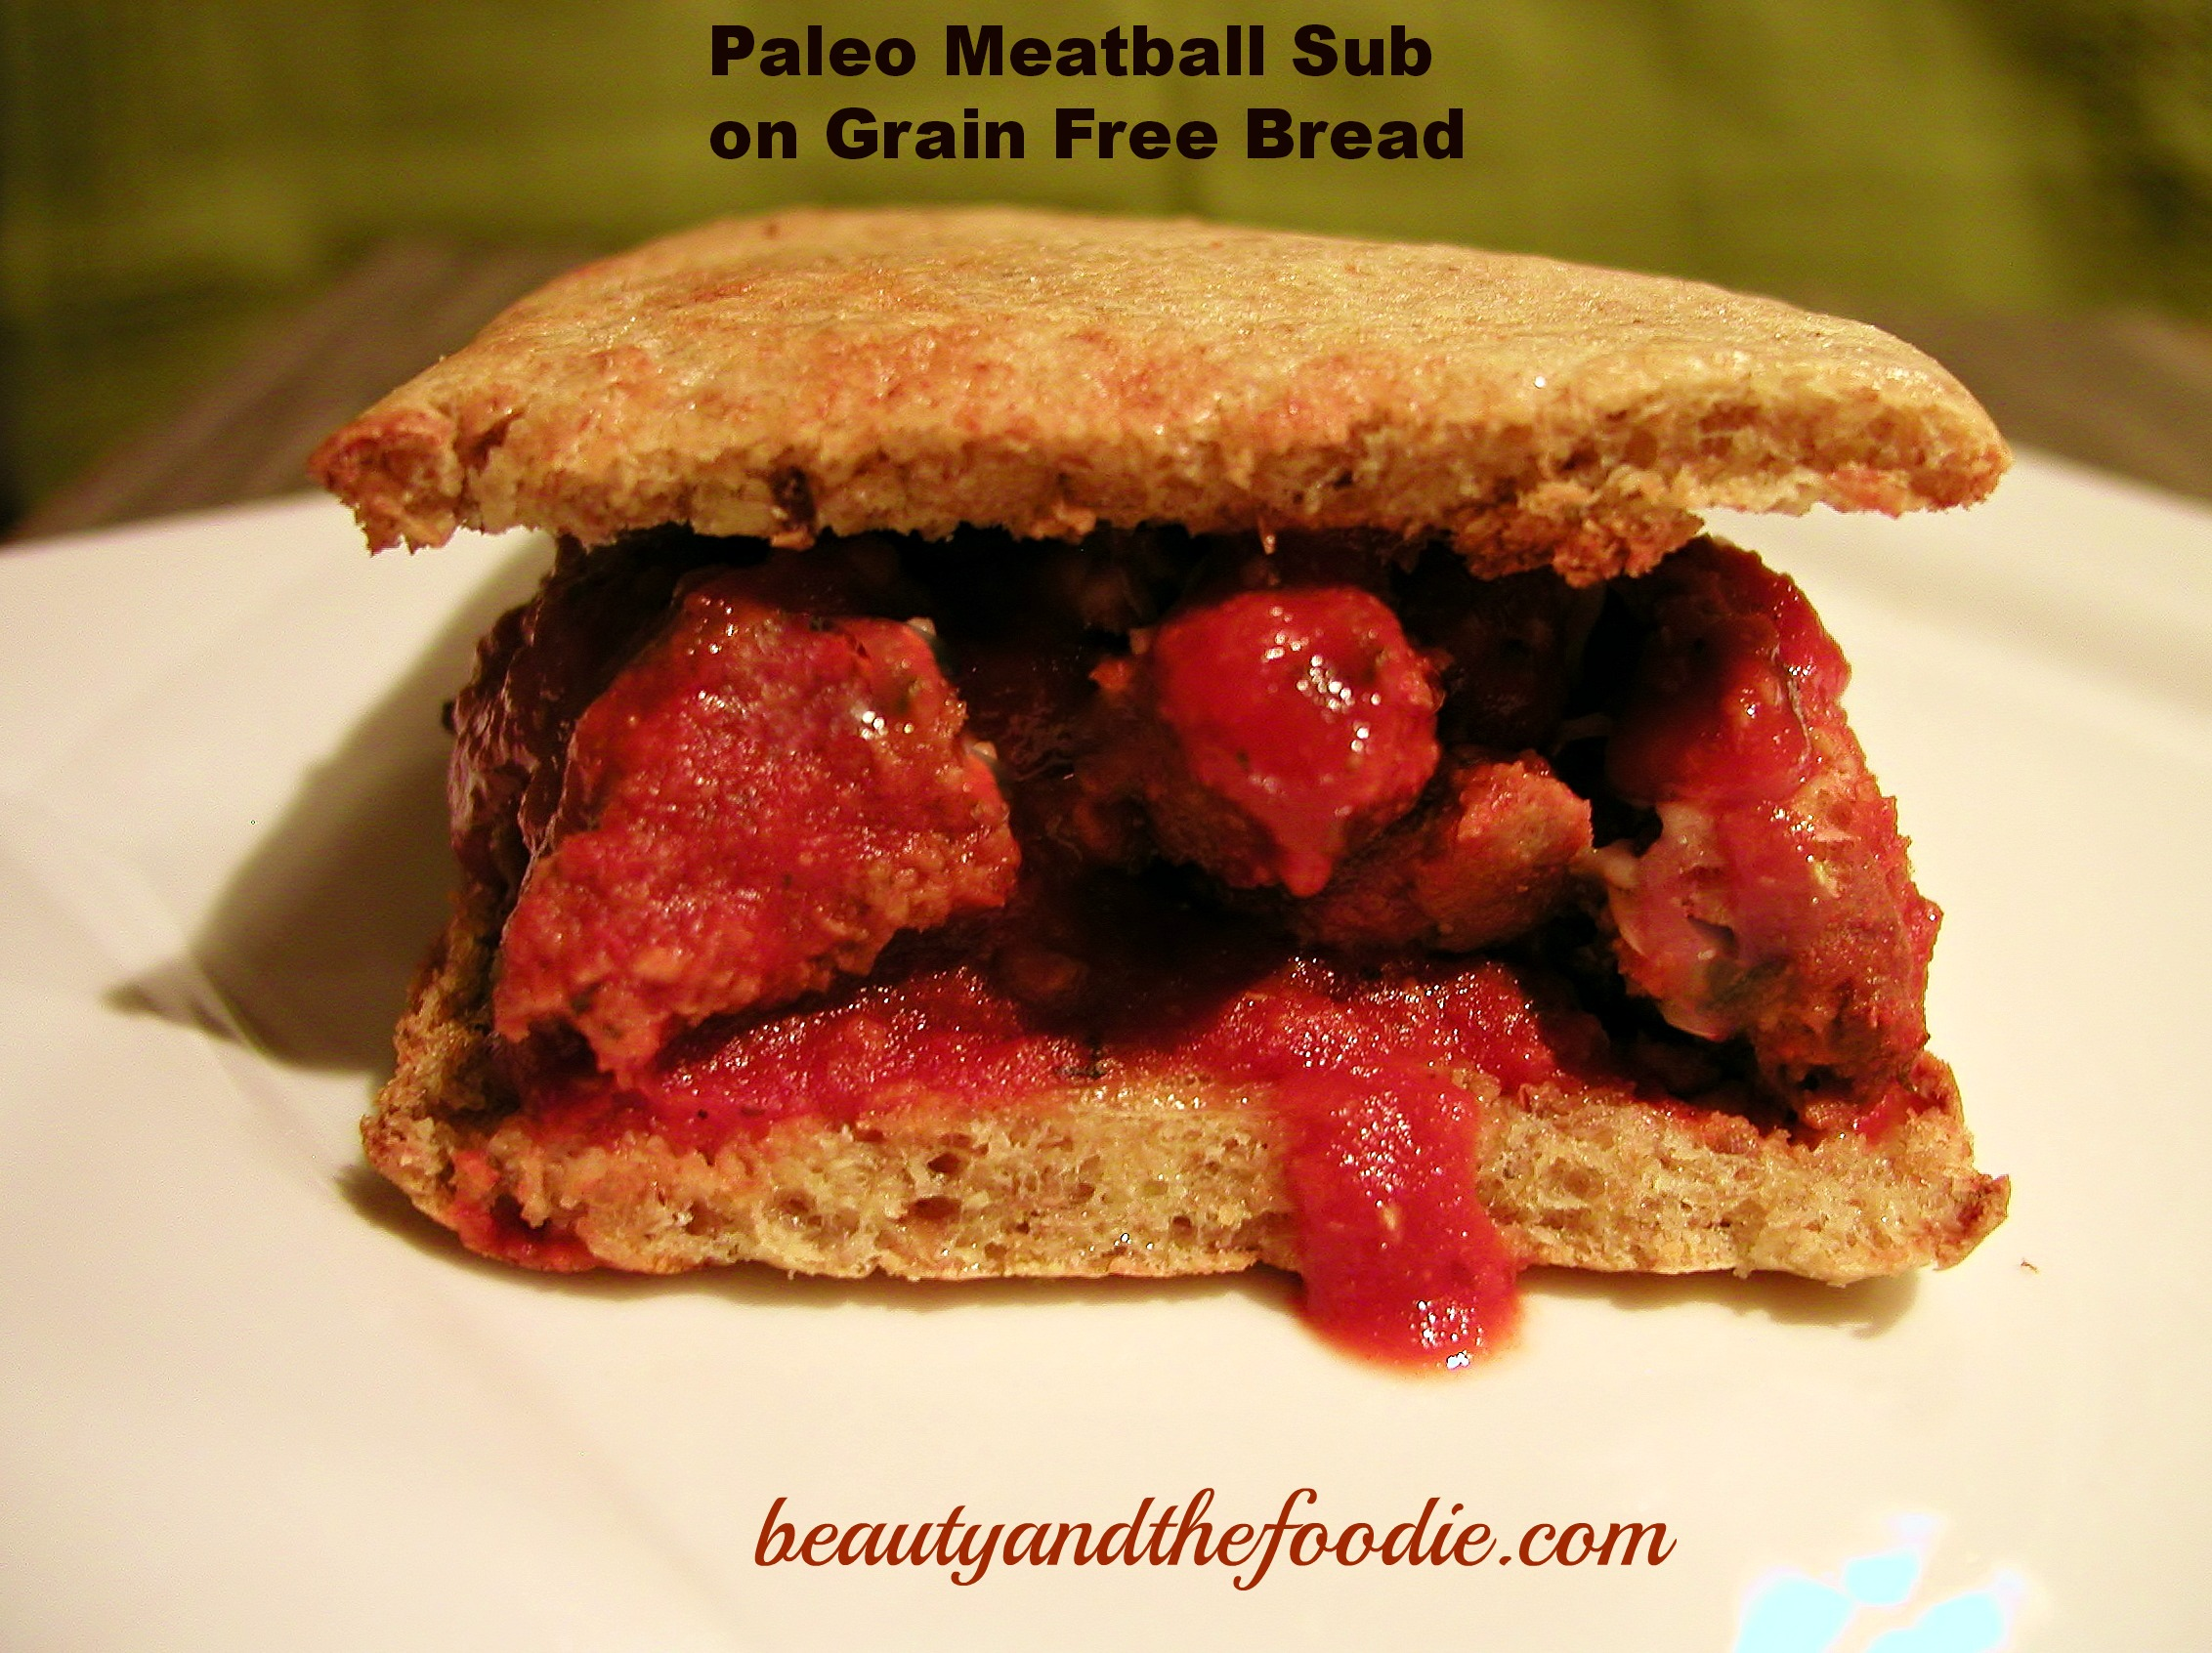 Paleo Meatball Sub